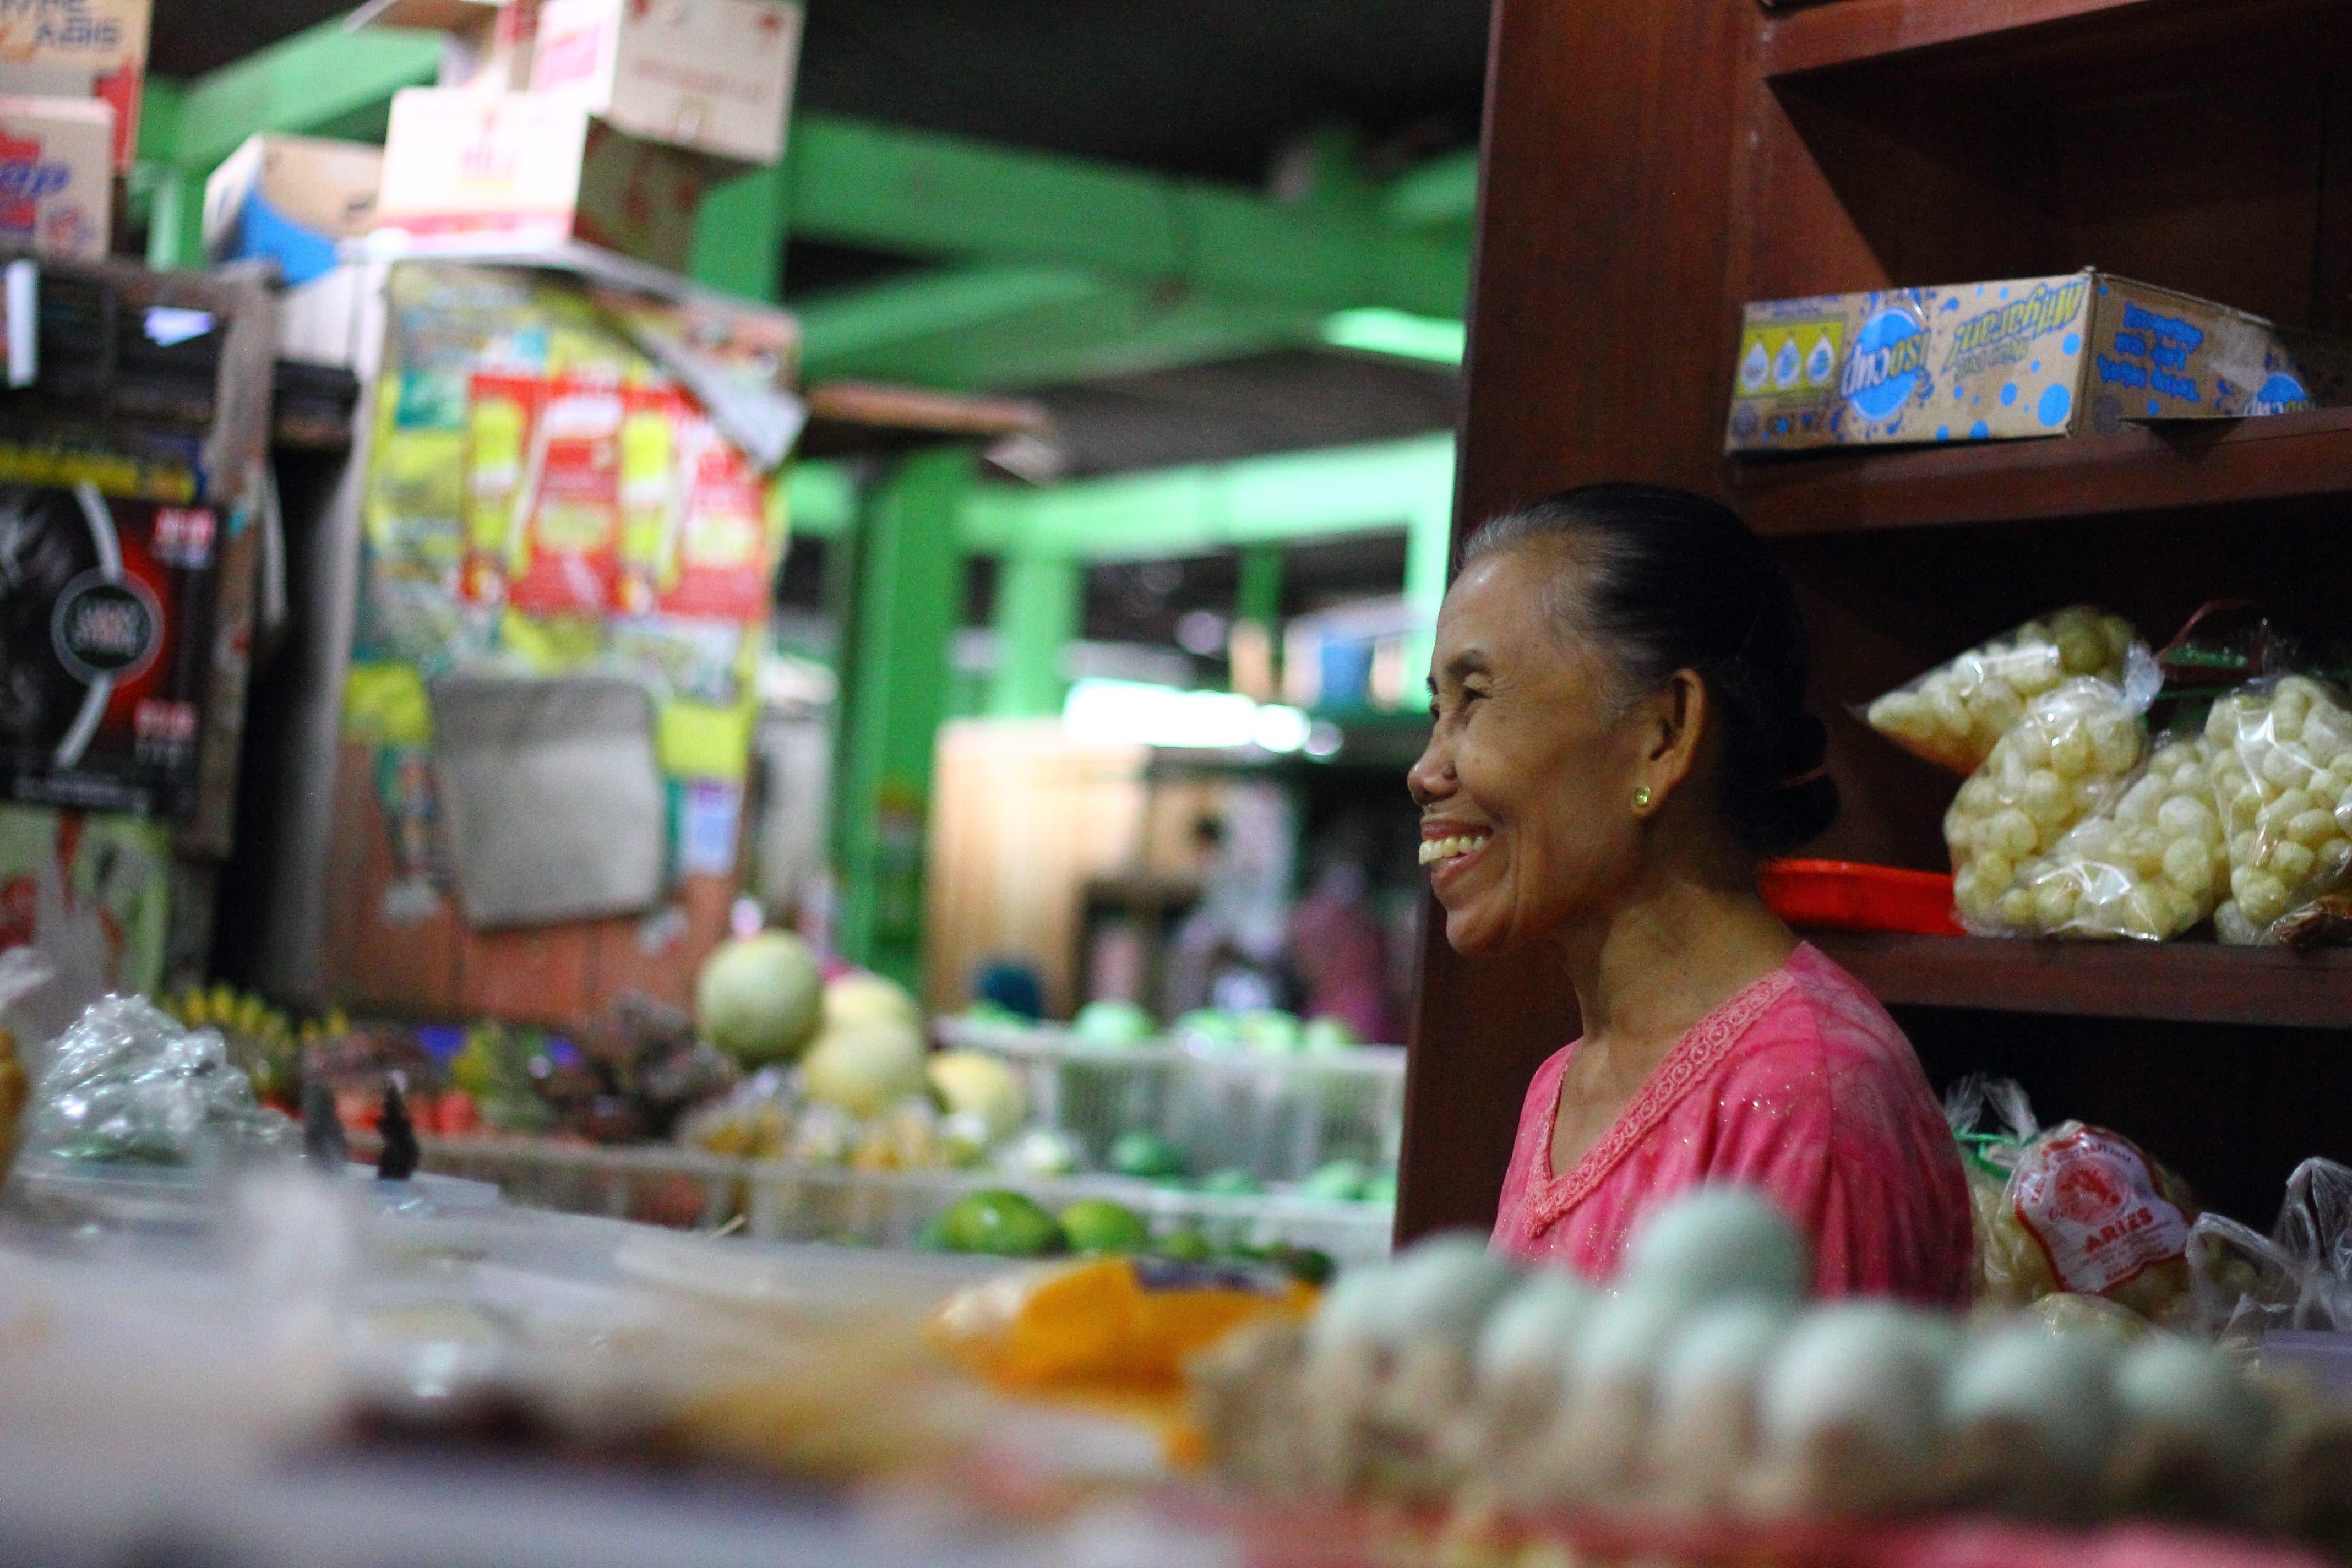 Penjual Jajanan Pasar di Sambilegi